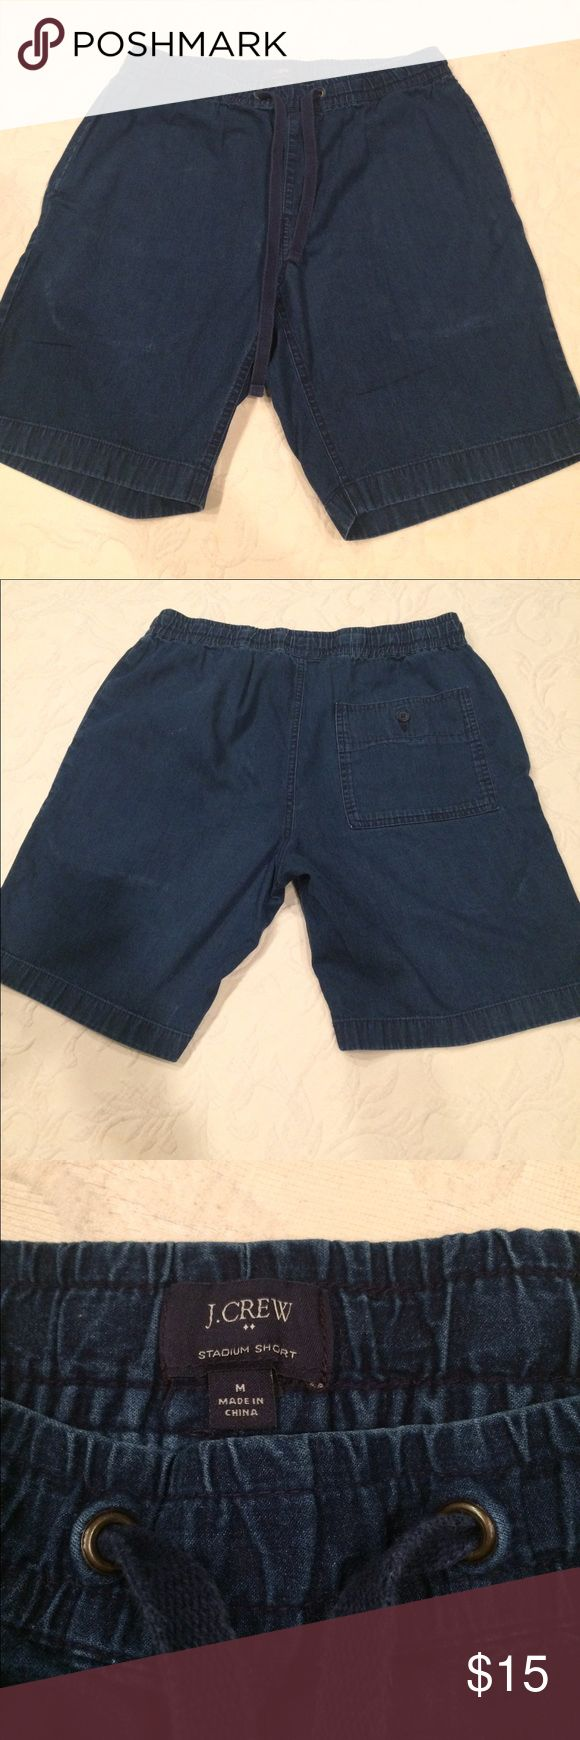 "Men's shorts JCrew men's shorts medium 8.5"" length J. Crew Shorts Jean Shorts"